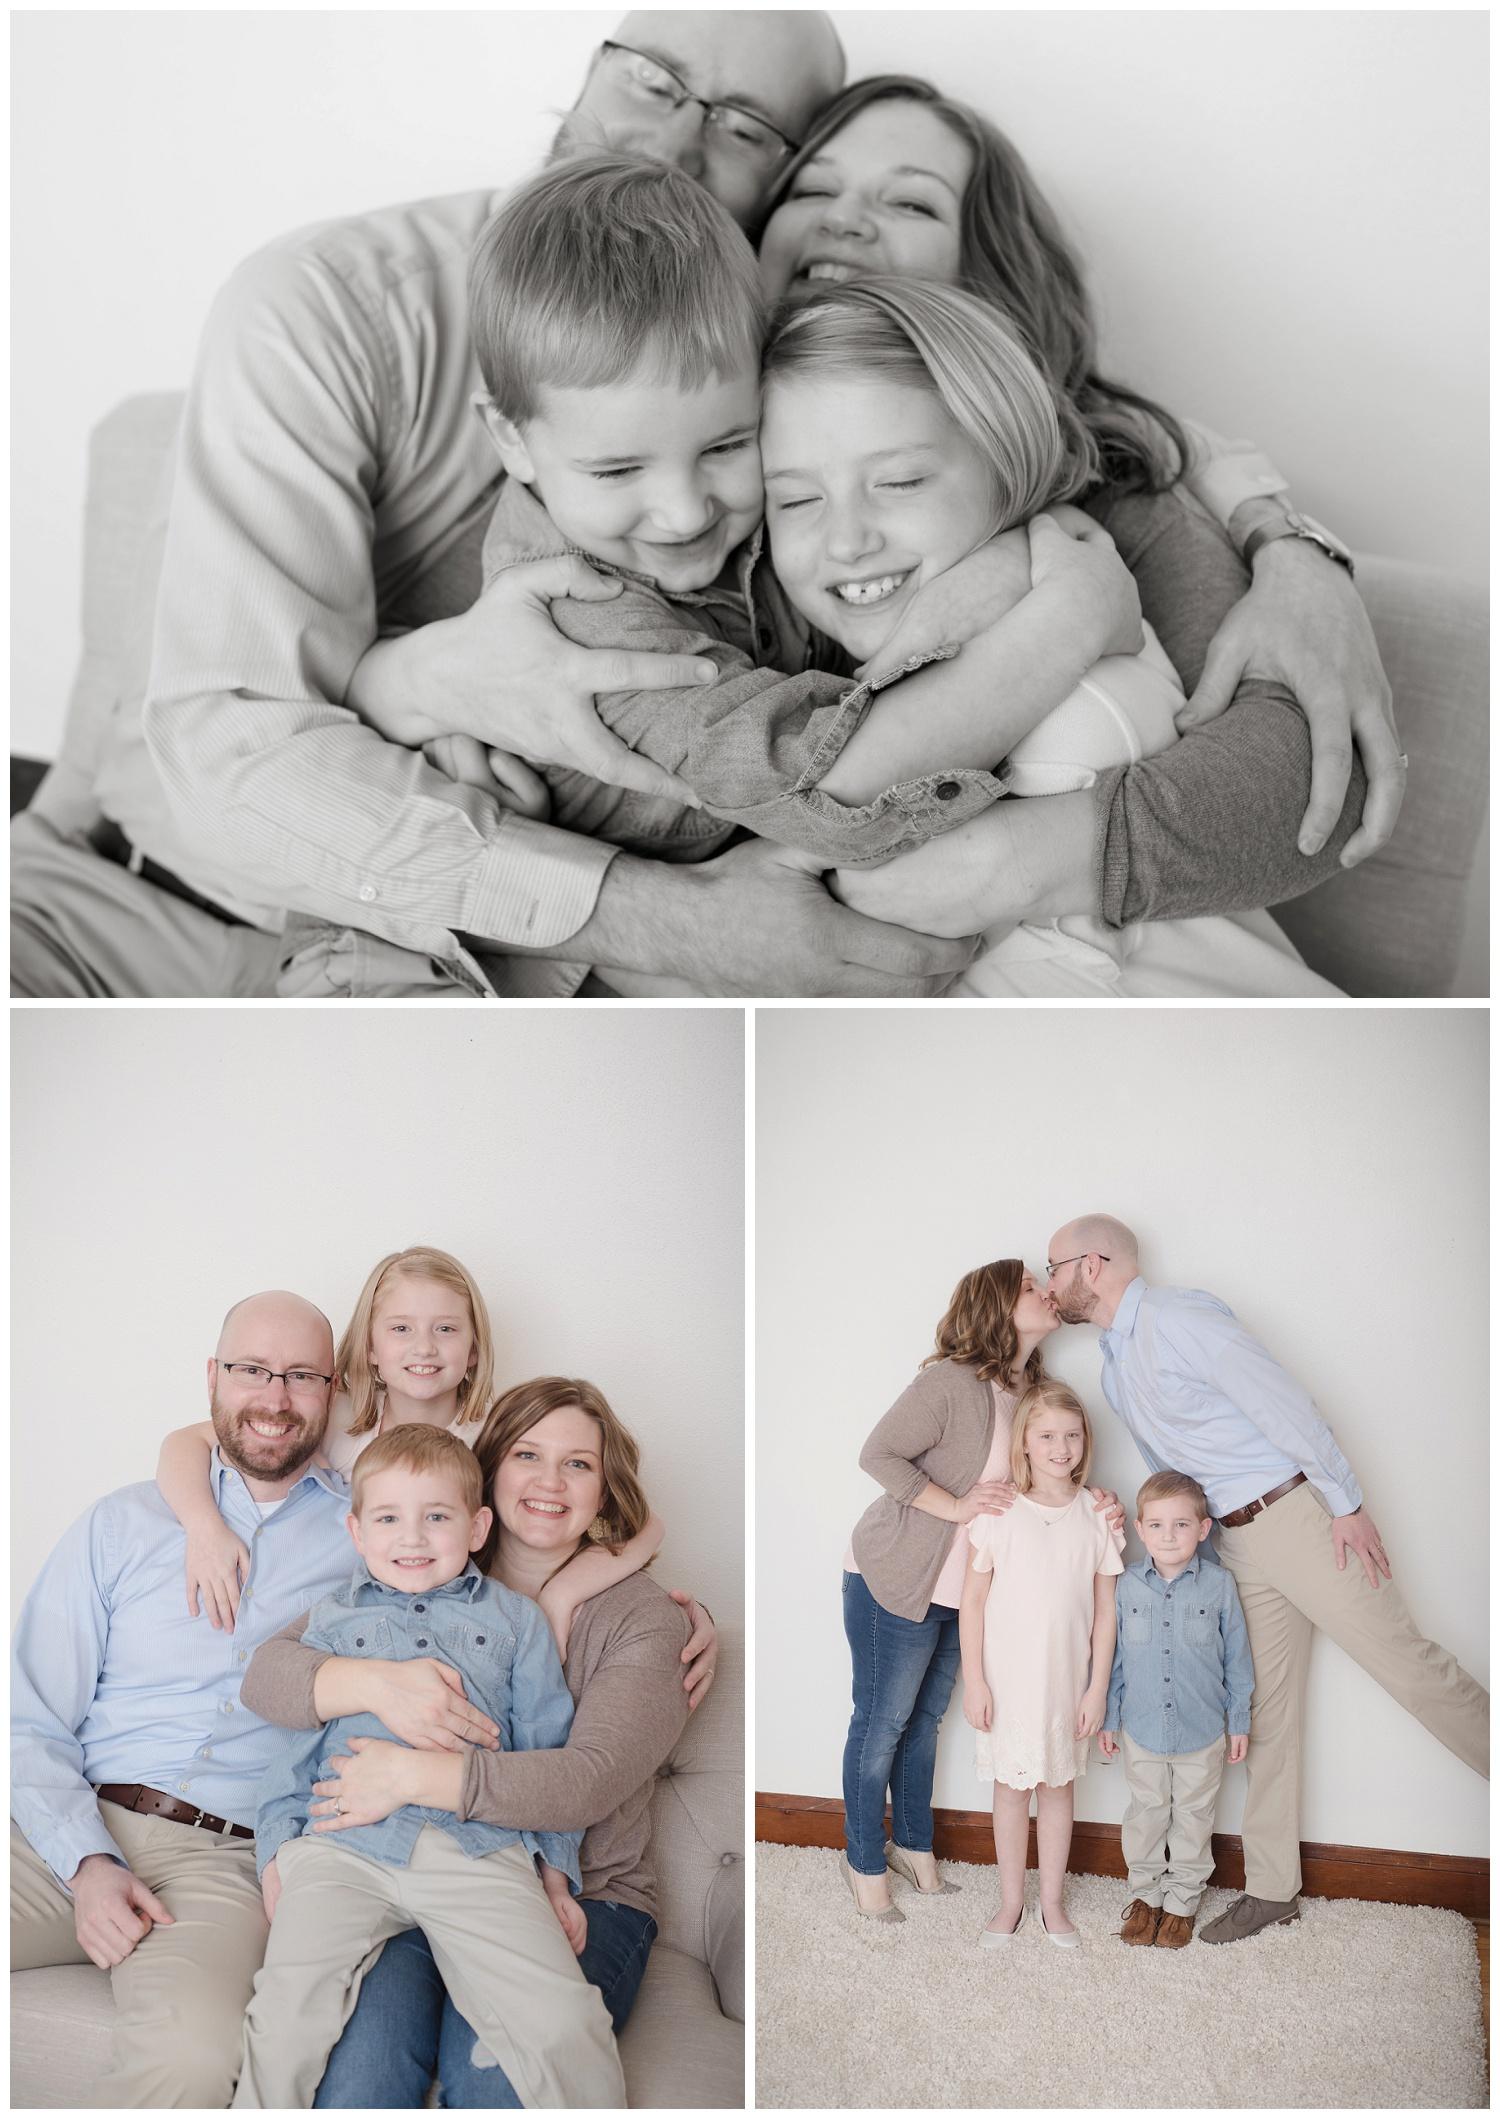 Gianna's Photography Portrait Family Studio Photographer Medina Minnesota